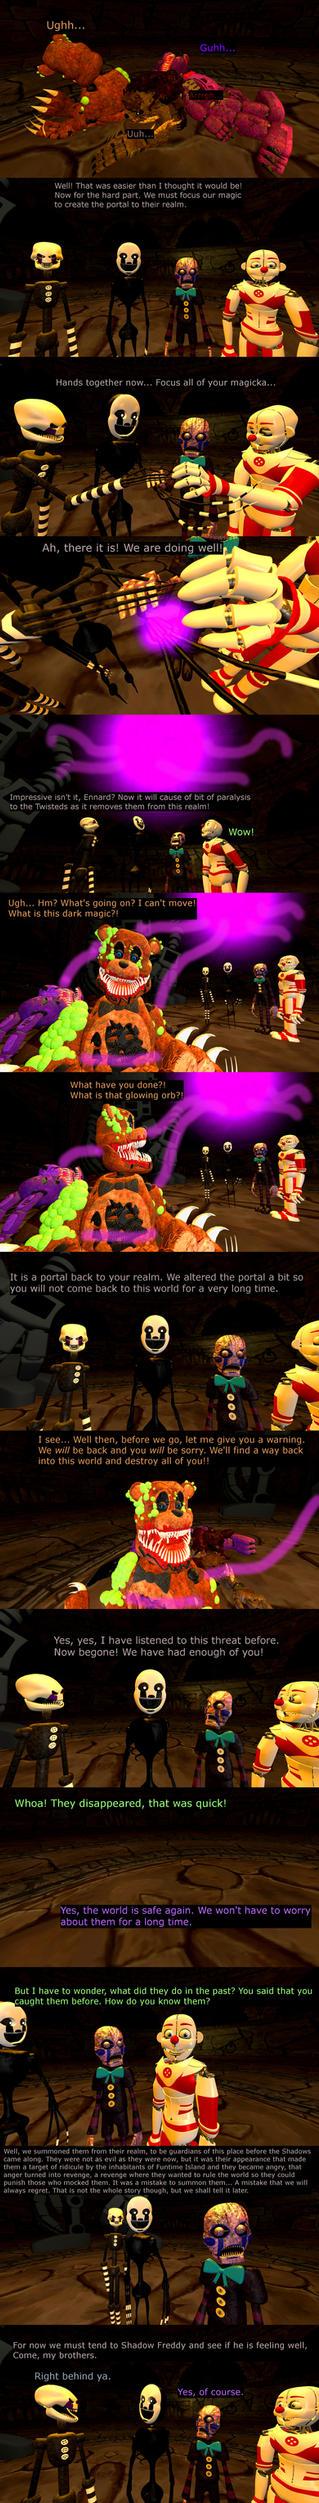 Bedtime Story 2 Part 18 by EmeraldWerewolfHeart